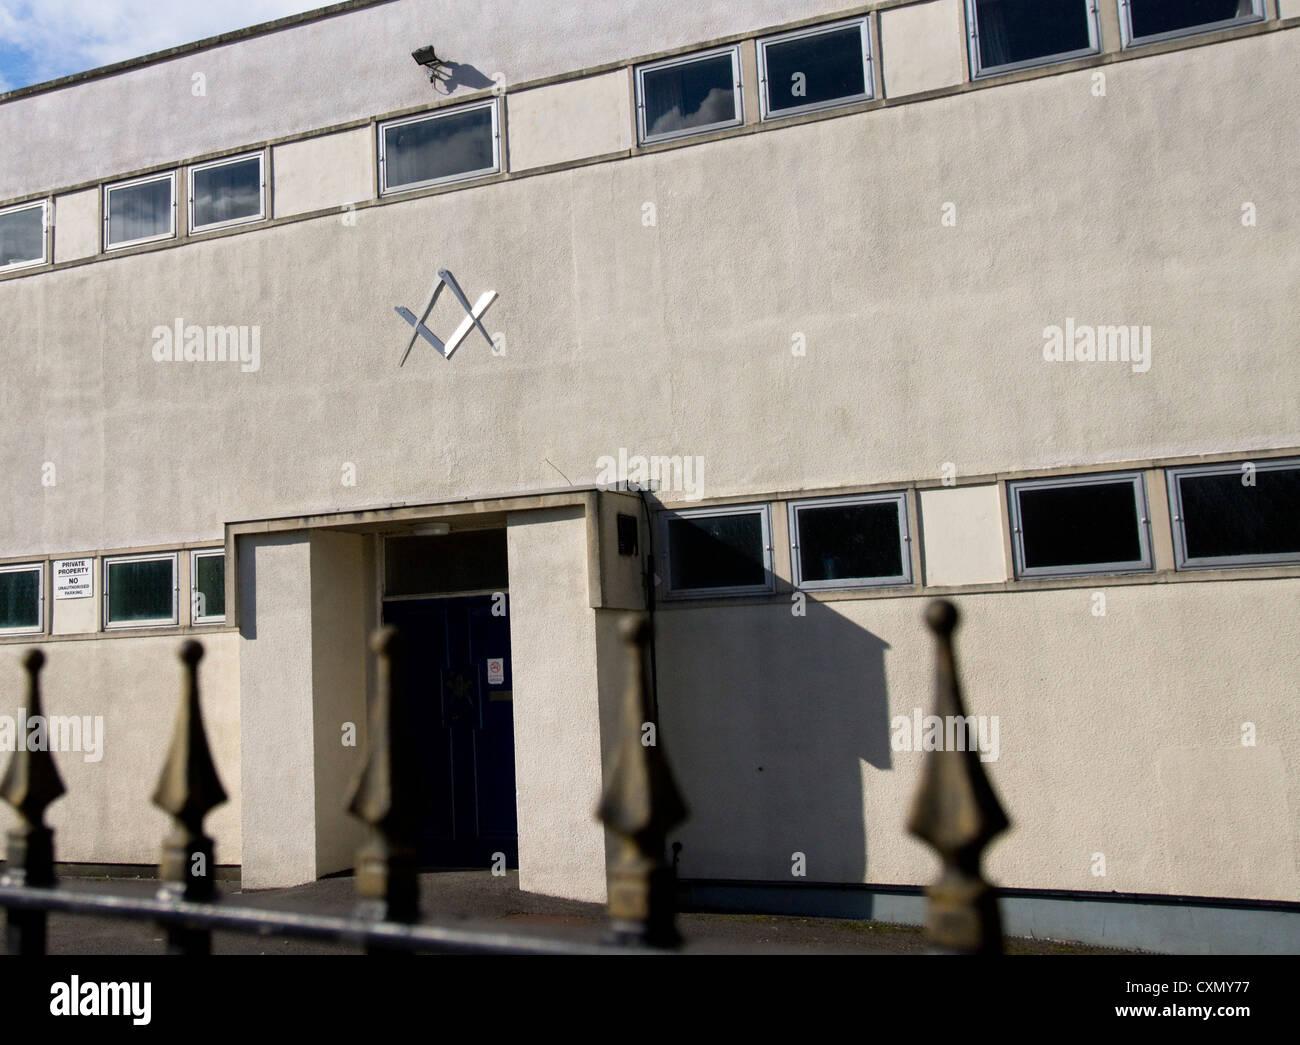 The Masonic Hall in Chippenham Wiltshire England - Stock Image